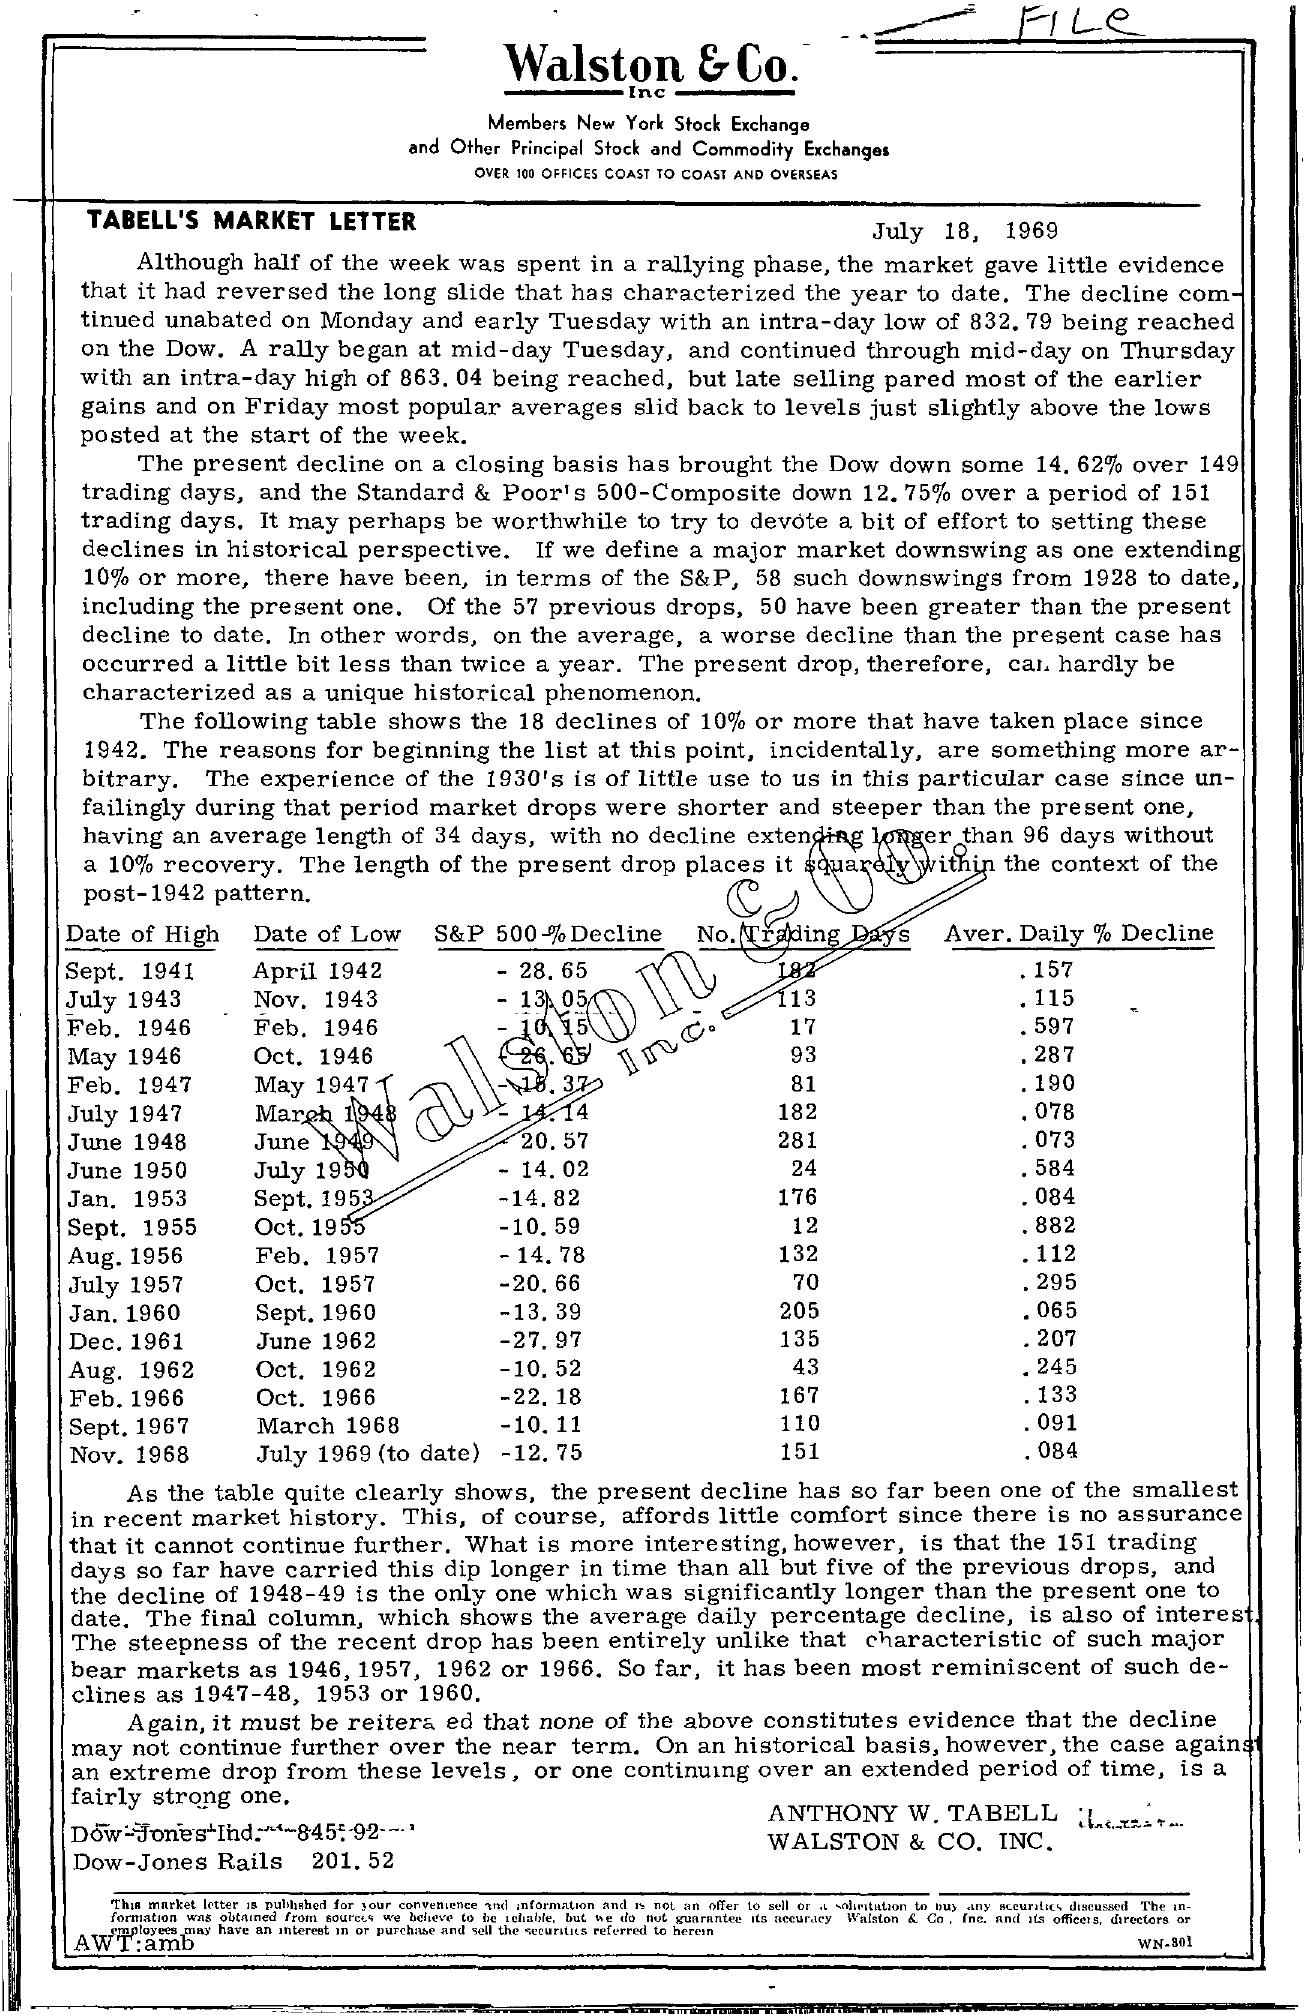 Tabell's Market Letter - July 18, 1969